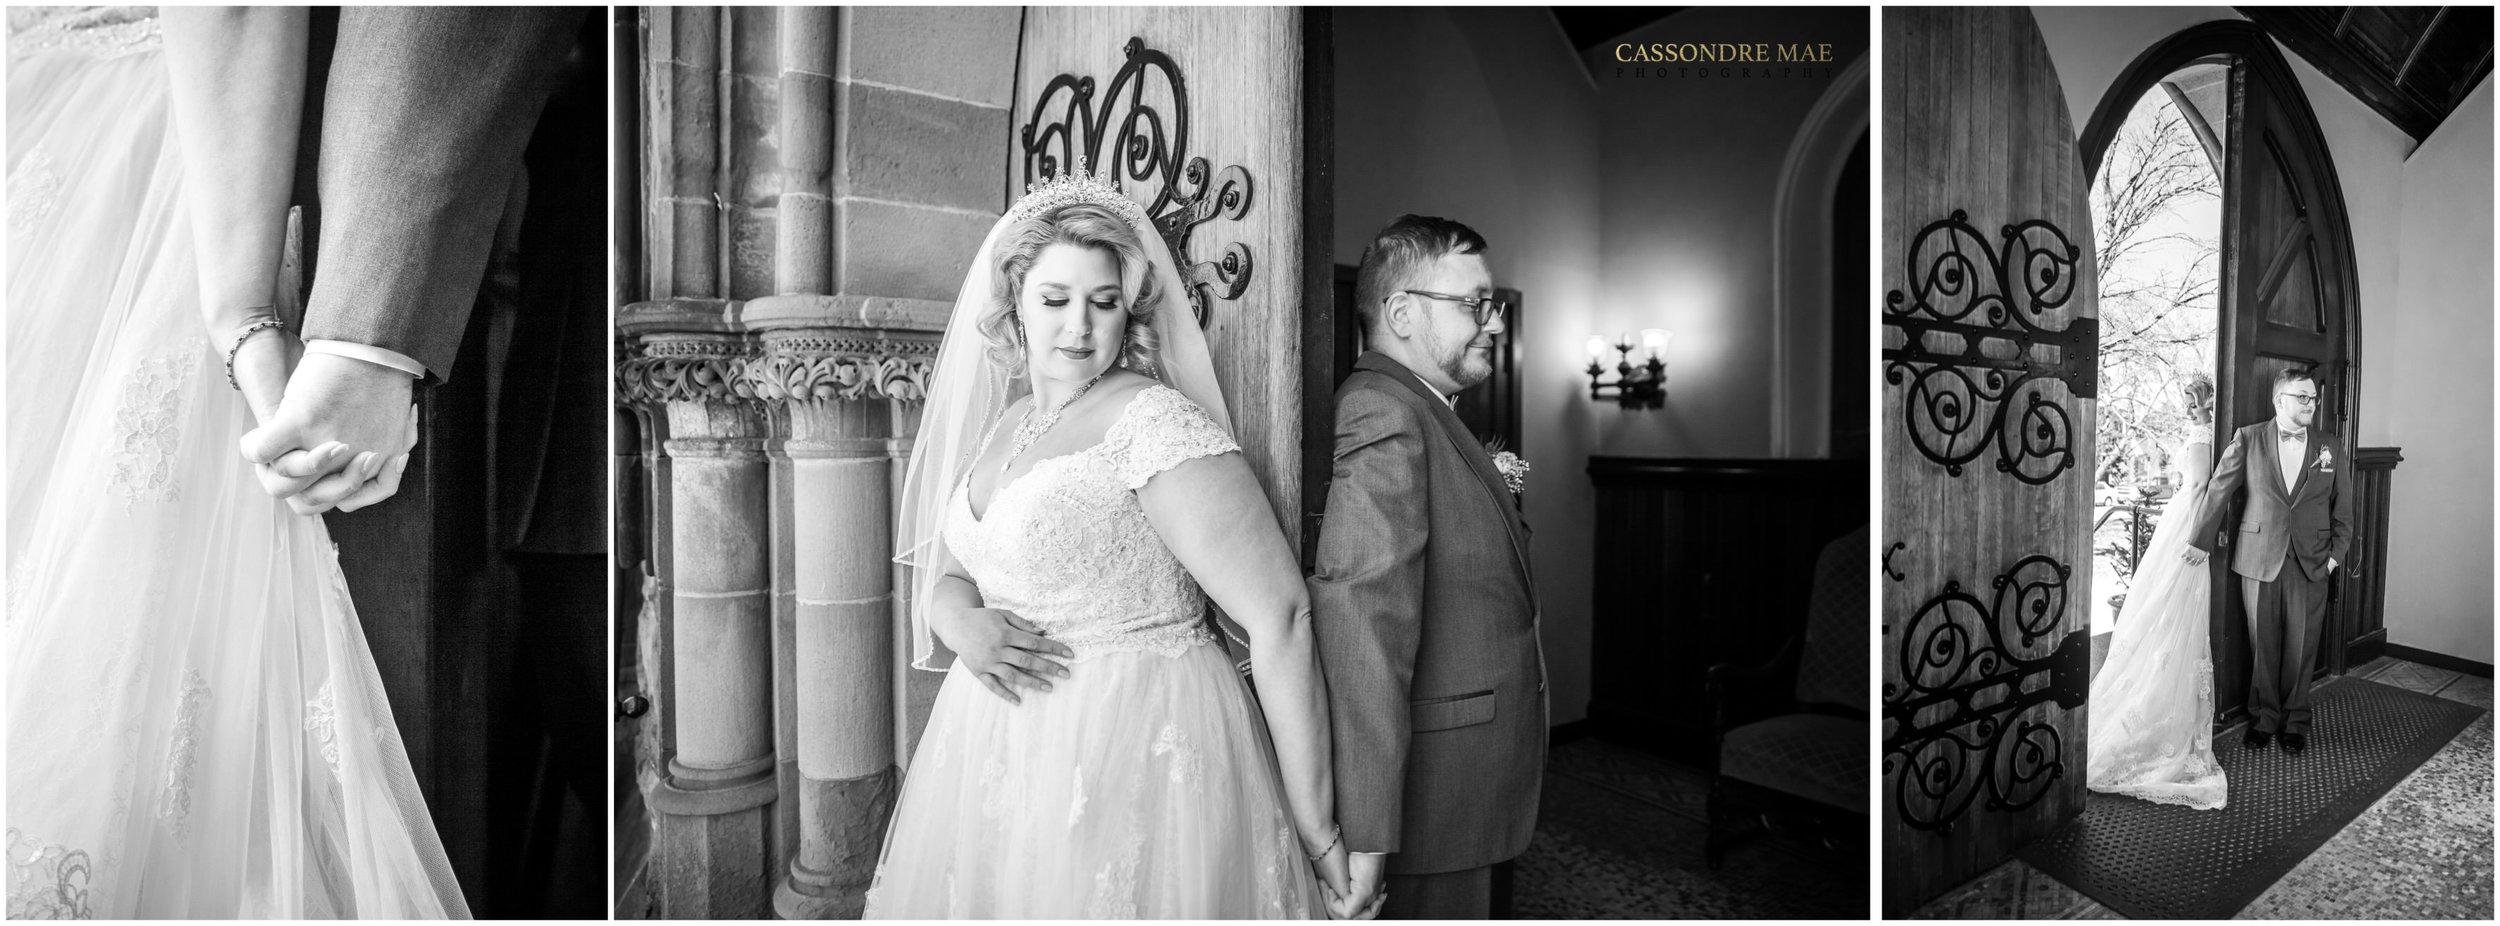 Cassondre Mae Photography Poughkeepsie NY Wedding 13.jpg